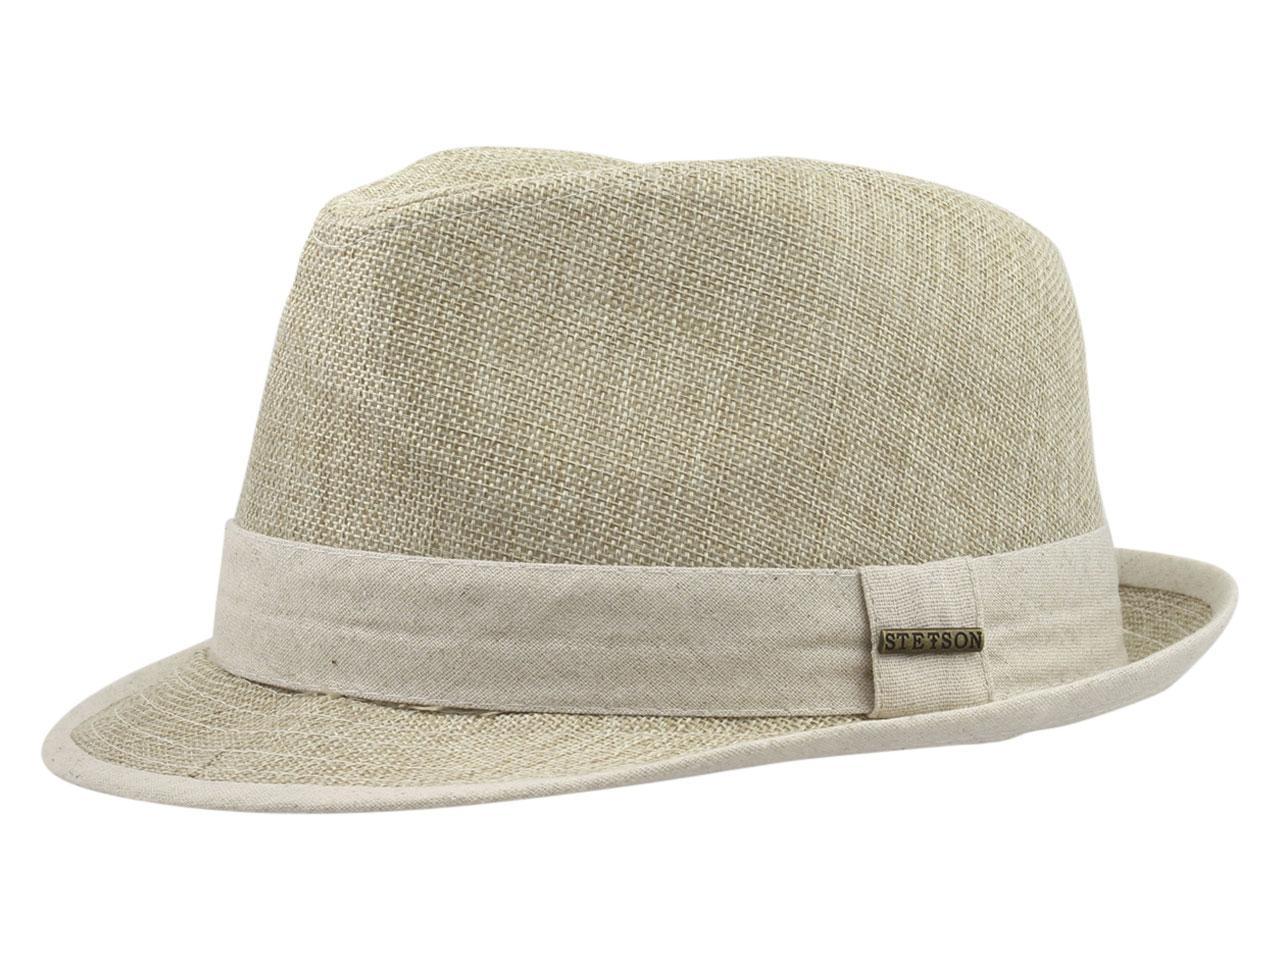 Image of Stetson Men's Contrast Trim Fedora Hat - Tan - X Large